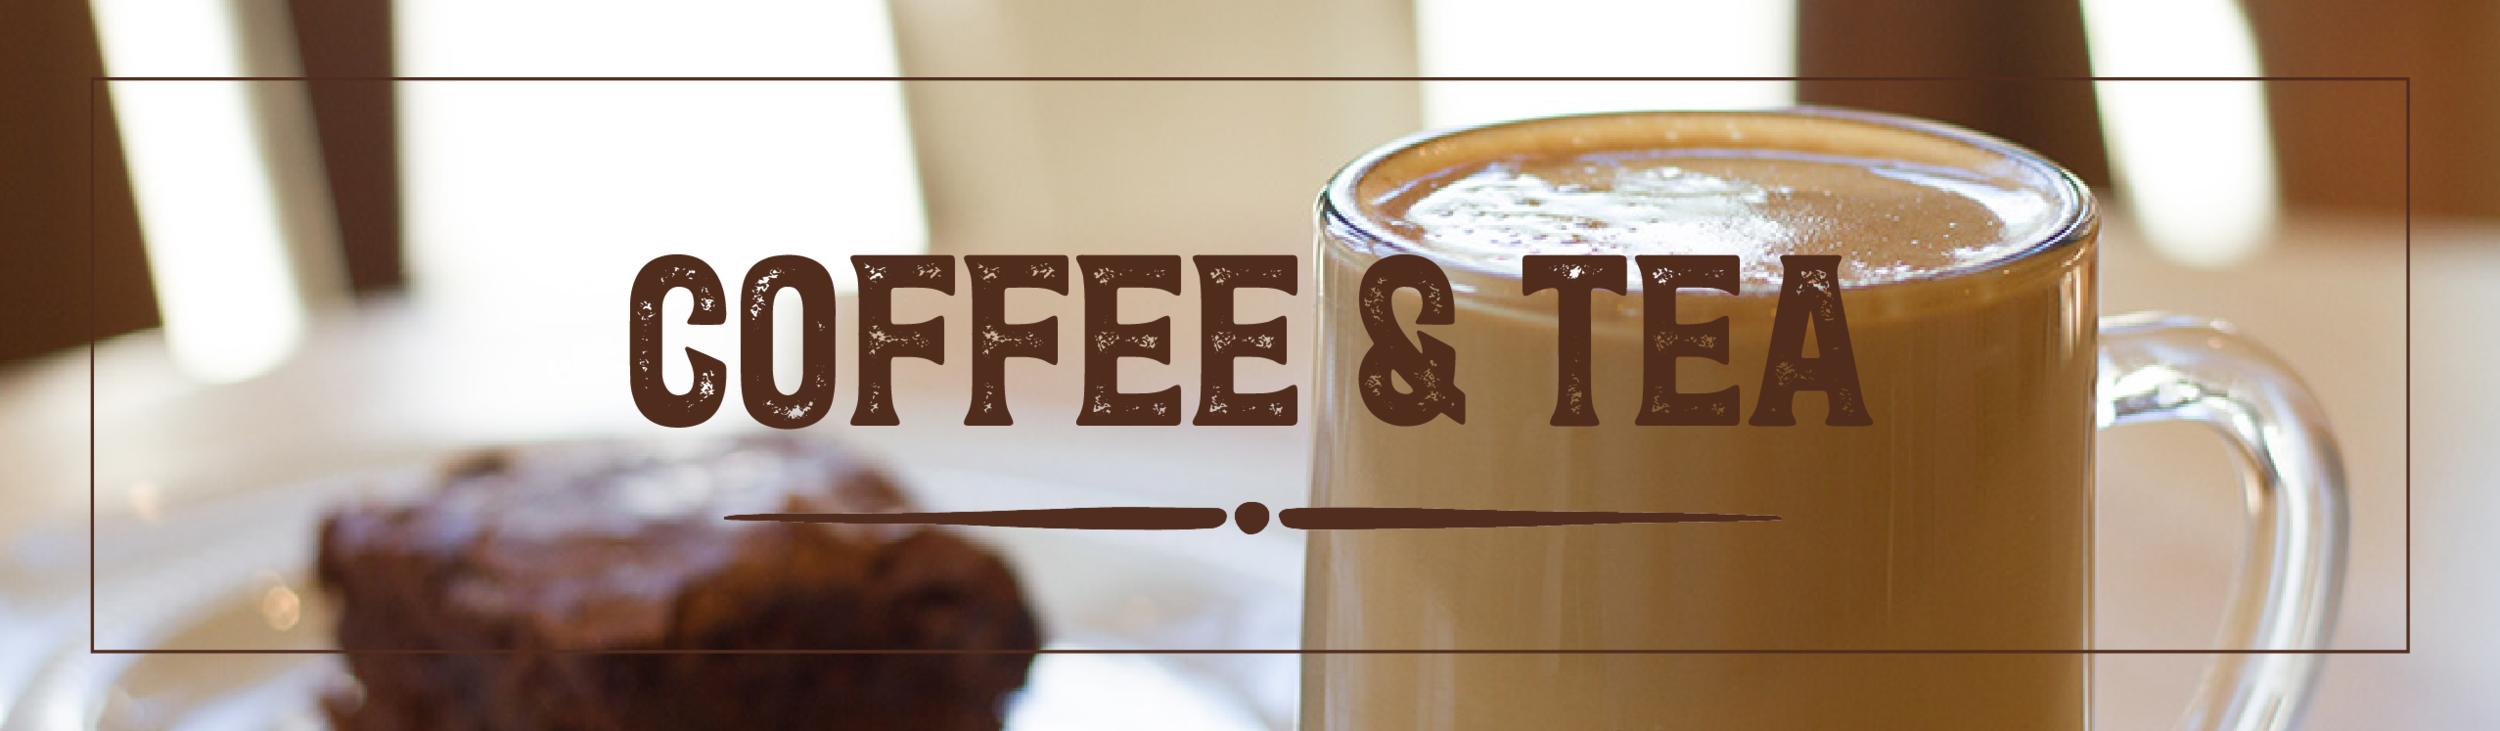 coffee_tea-01.png